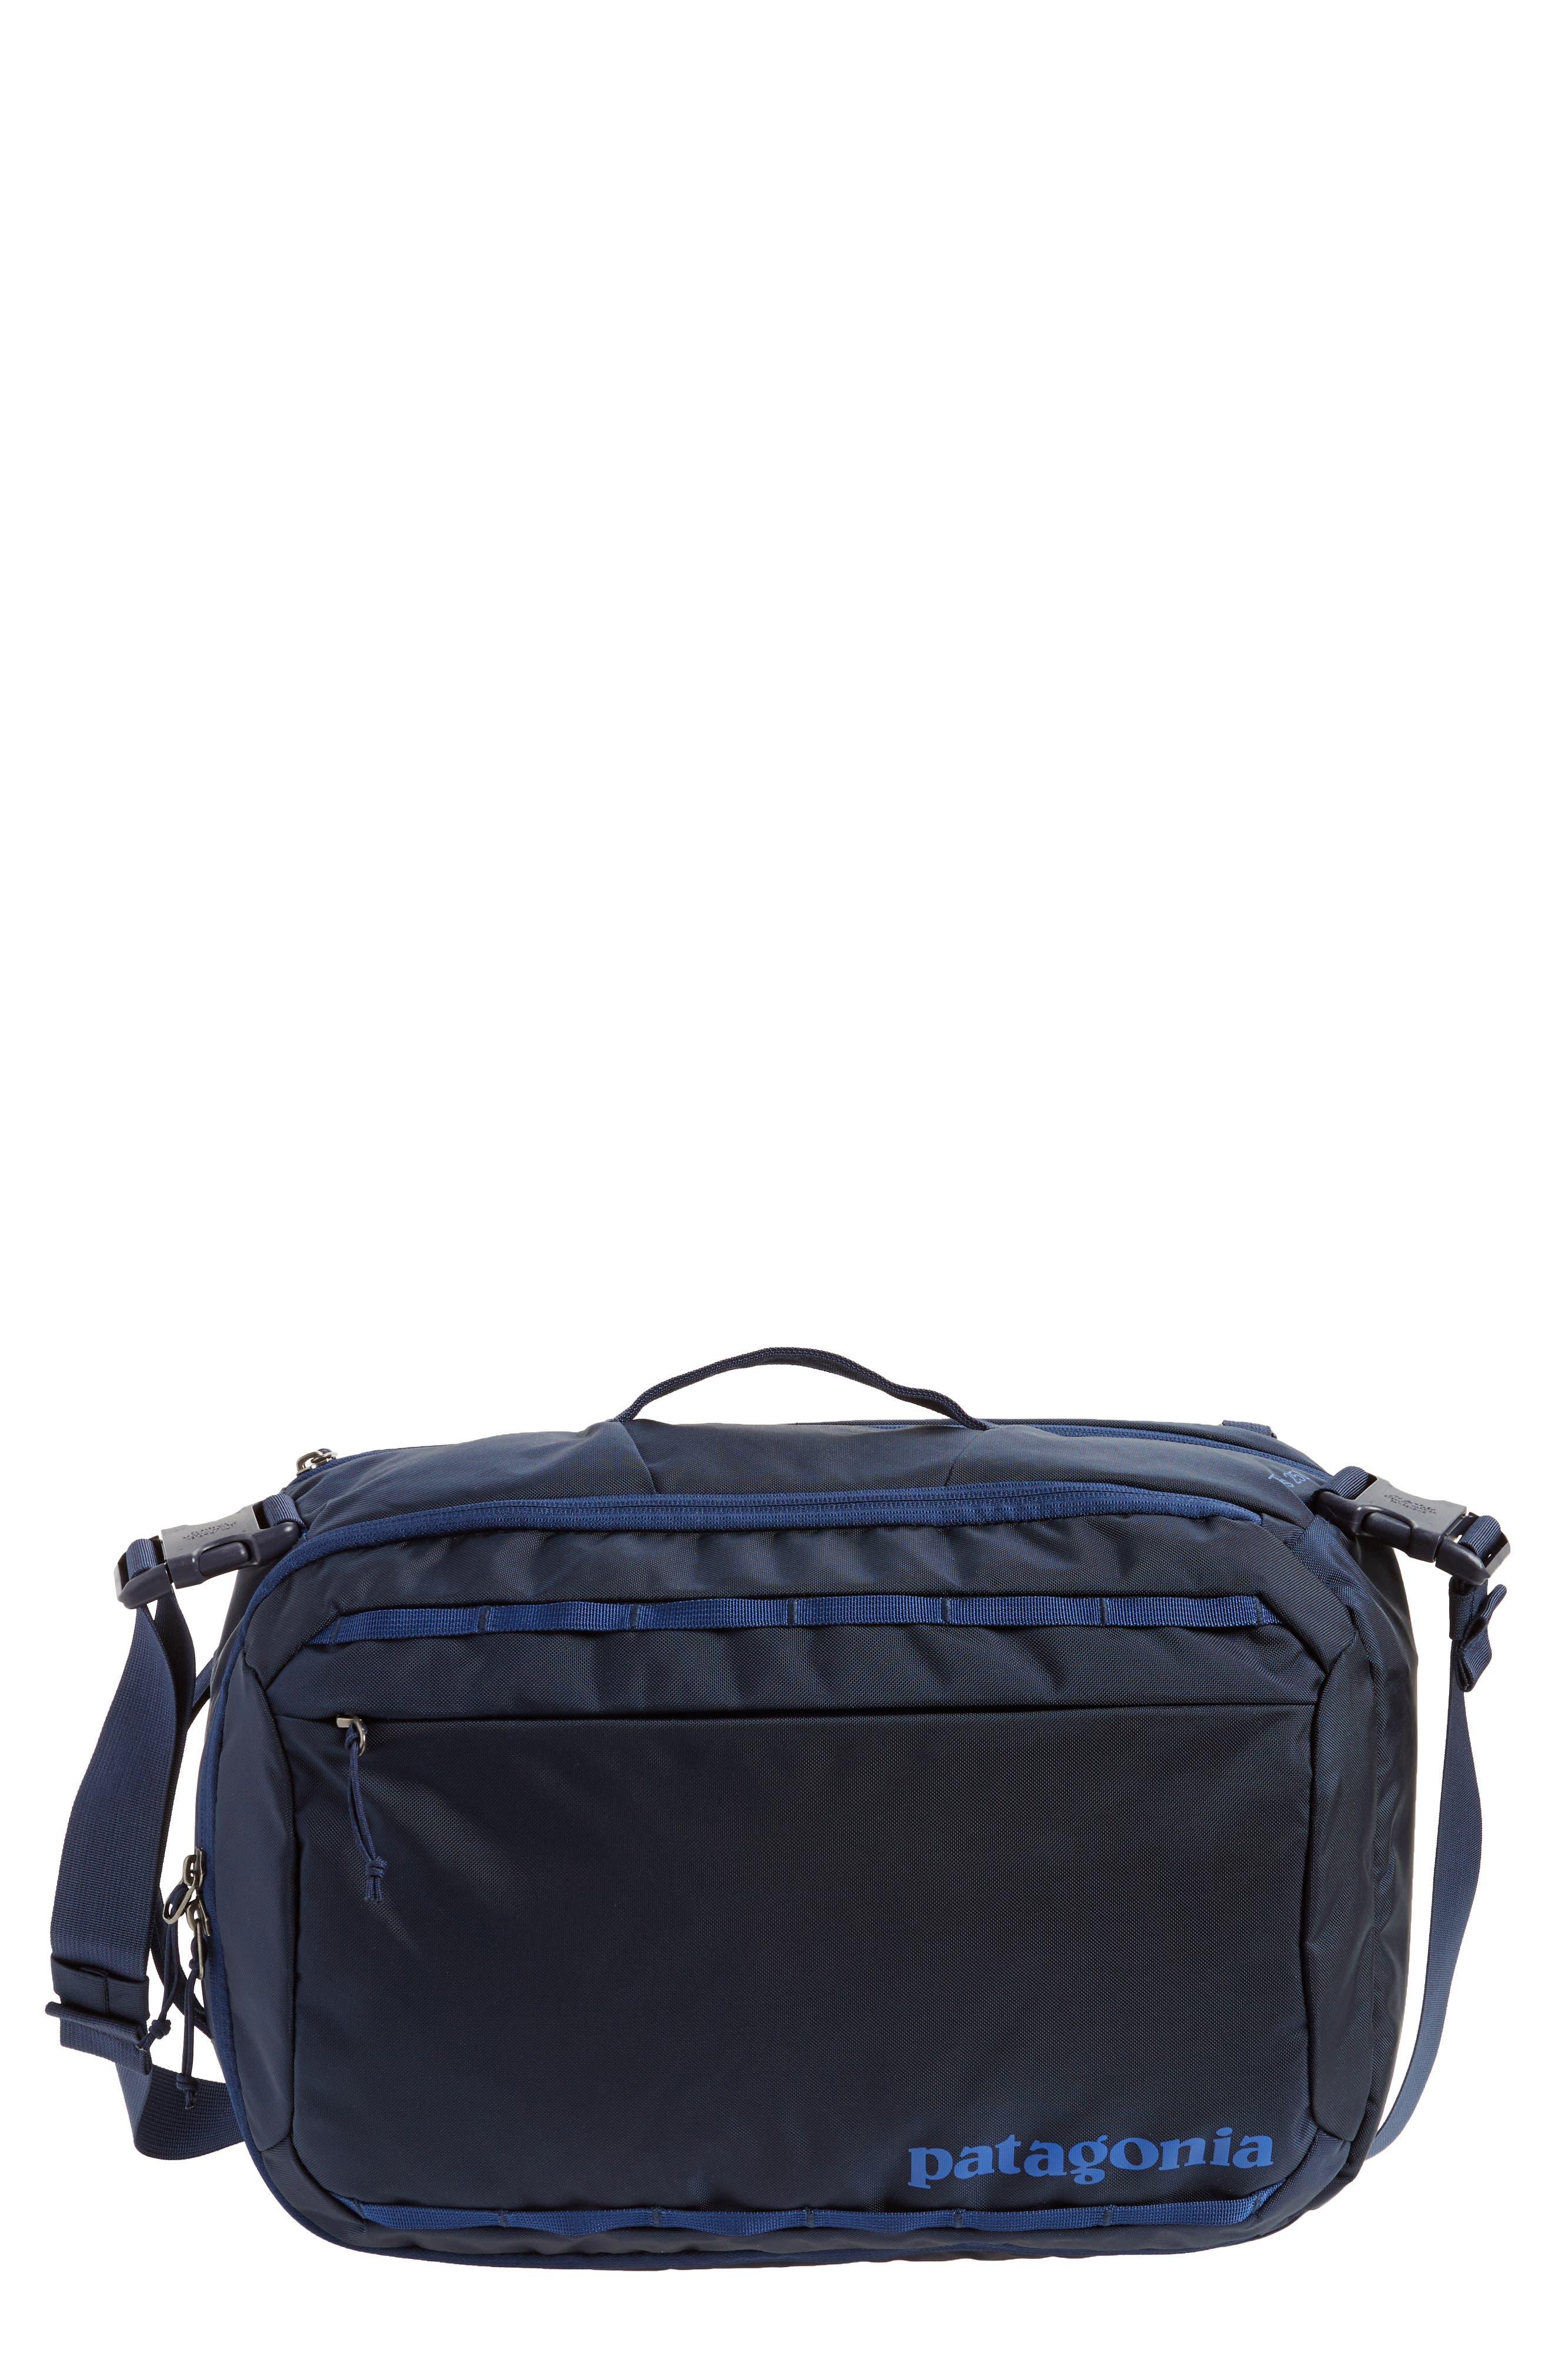 Main Image - Patagonia Tres 25-Liter Convertible Backpack